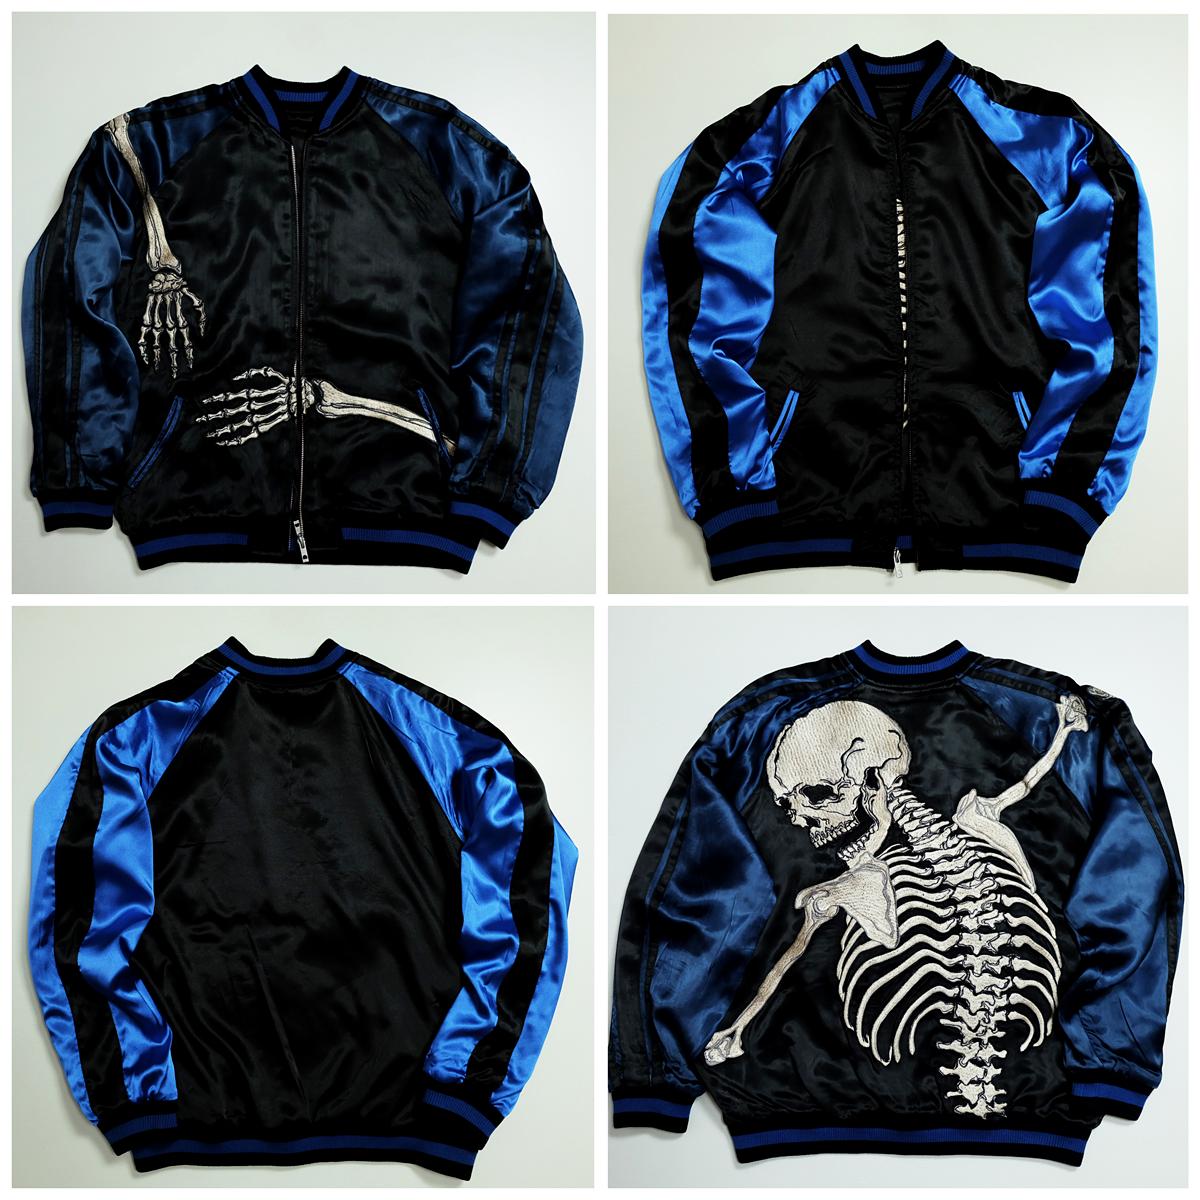 Vintage Japanese Japan Royal Blue Skeleton Skull Punk Rock Yokosuka Jumper Tattoo Art Embroidery Embroidered Bomber Sukajan Souvenir Jacket Tour Jacket Size Souvenir Jacket Jackets Custom Clothes [ 1200 x 1200 Pixel ]